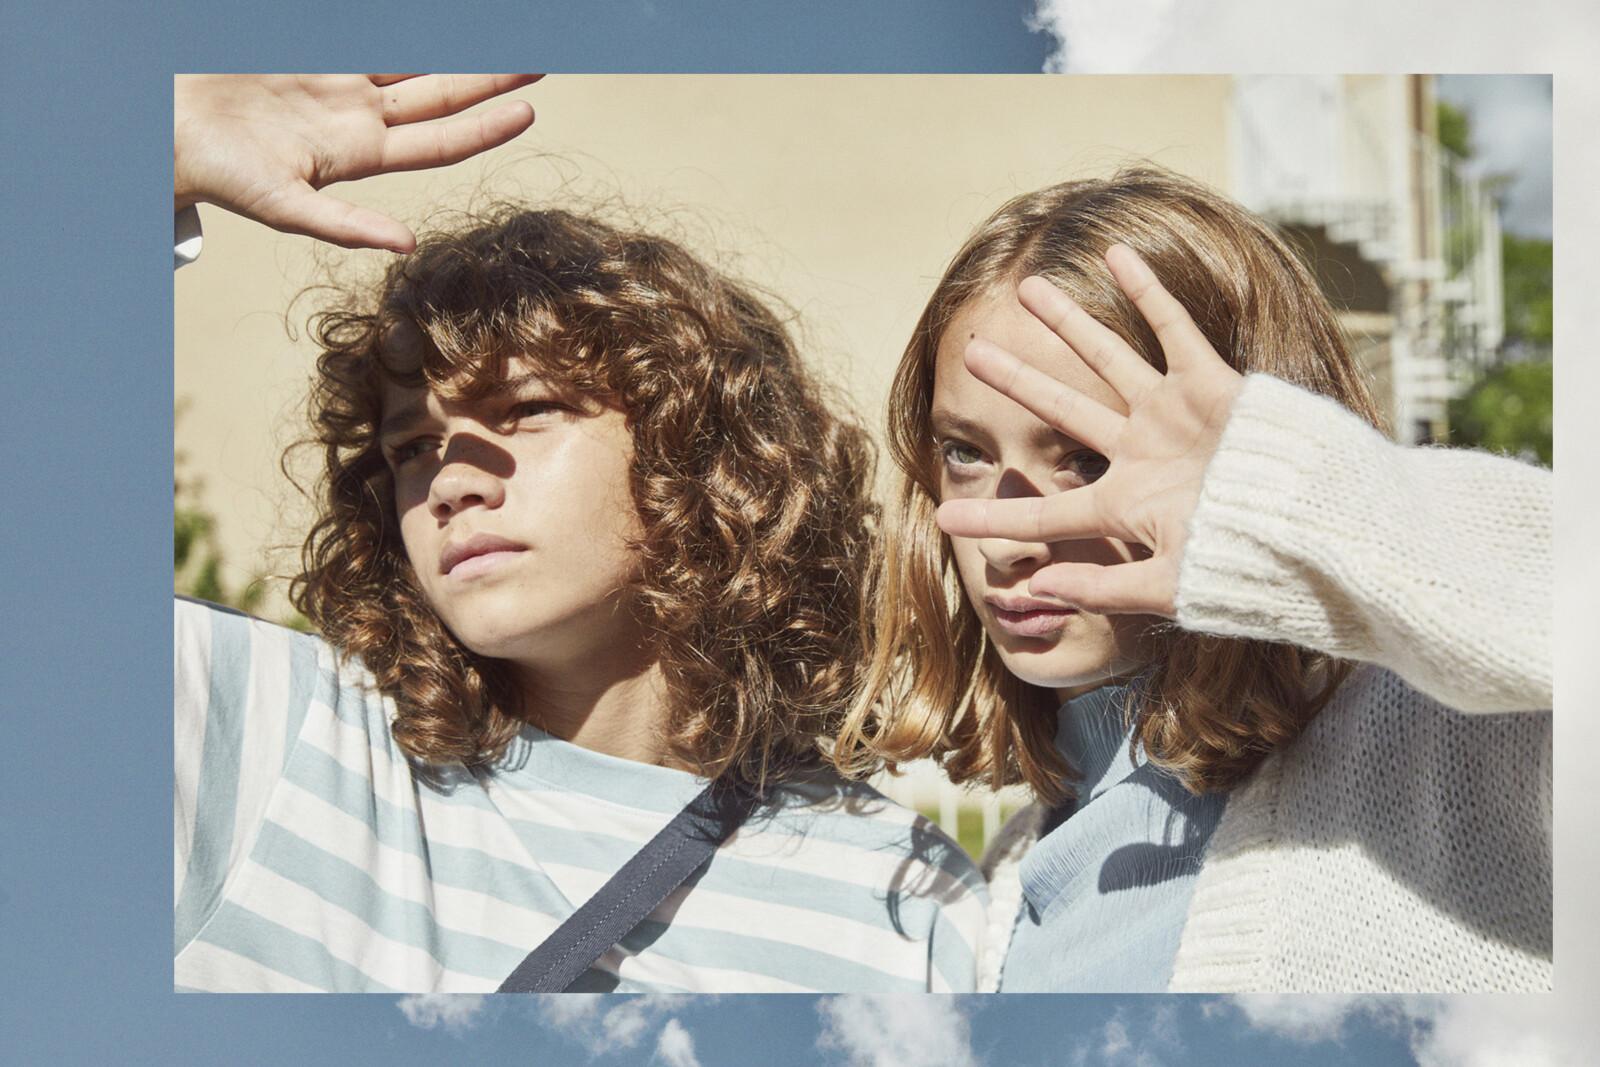 HansEricksson TWWP Teens 05